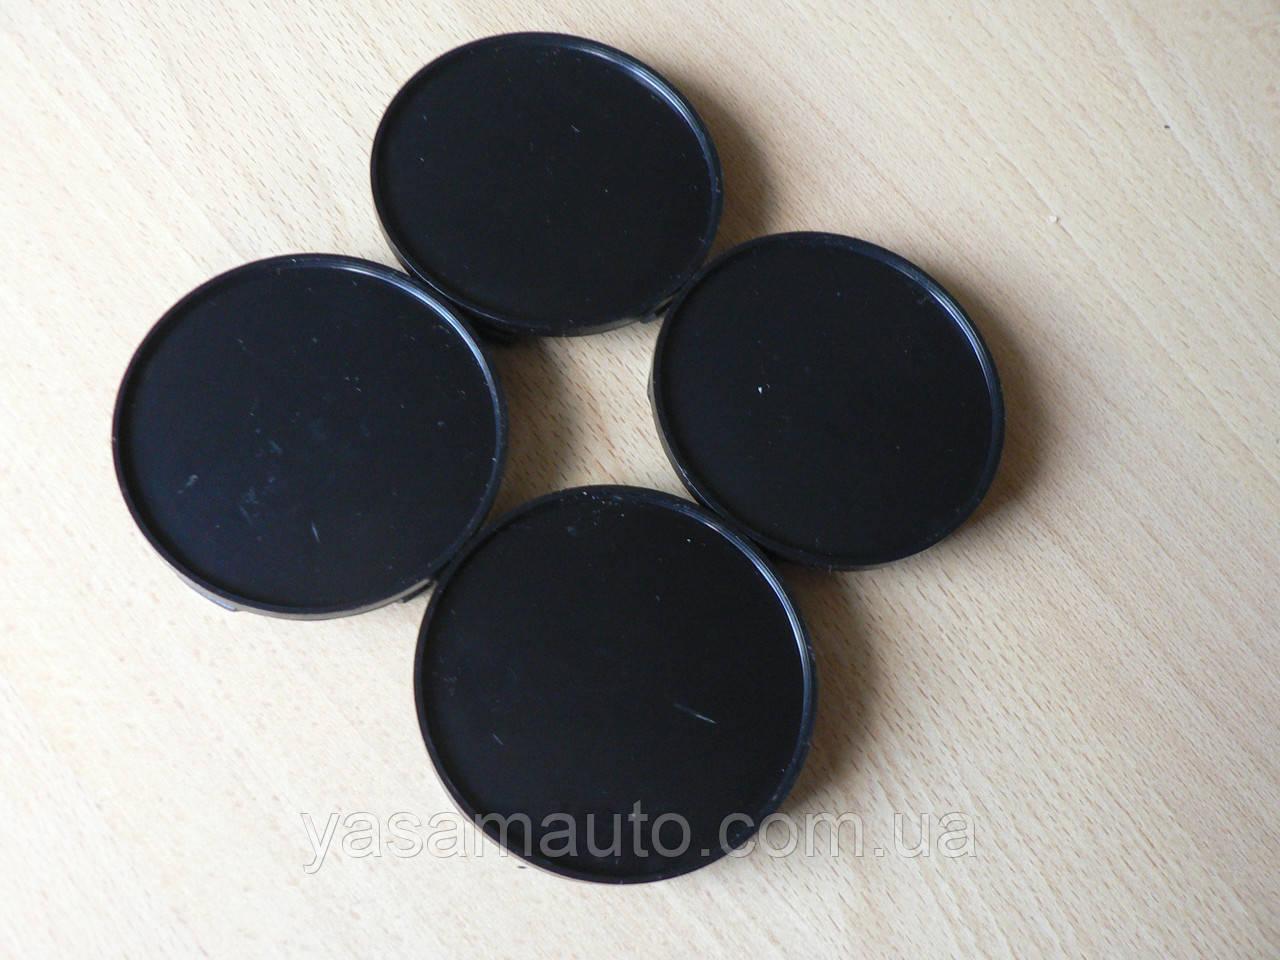 Колпачок 68х65 4шт вставка заглушка диаметры 68,5х64.6х67.2мм в на литой диск пластиковая на 5-ти защелках